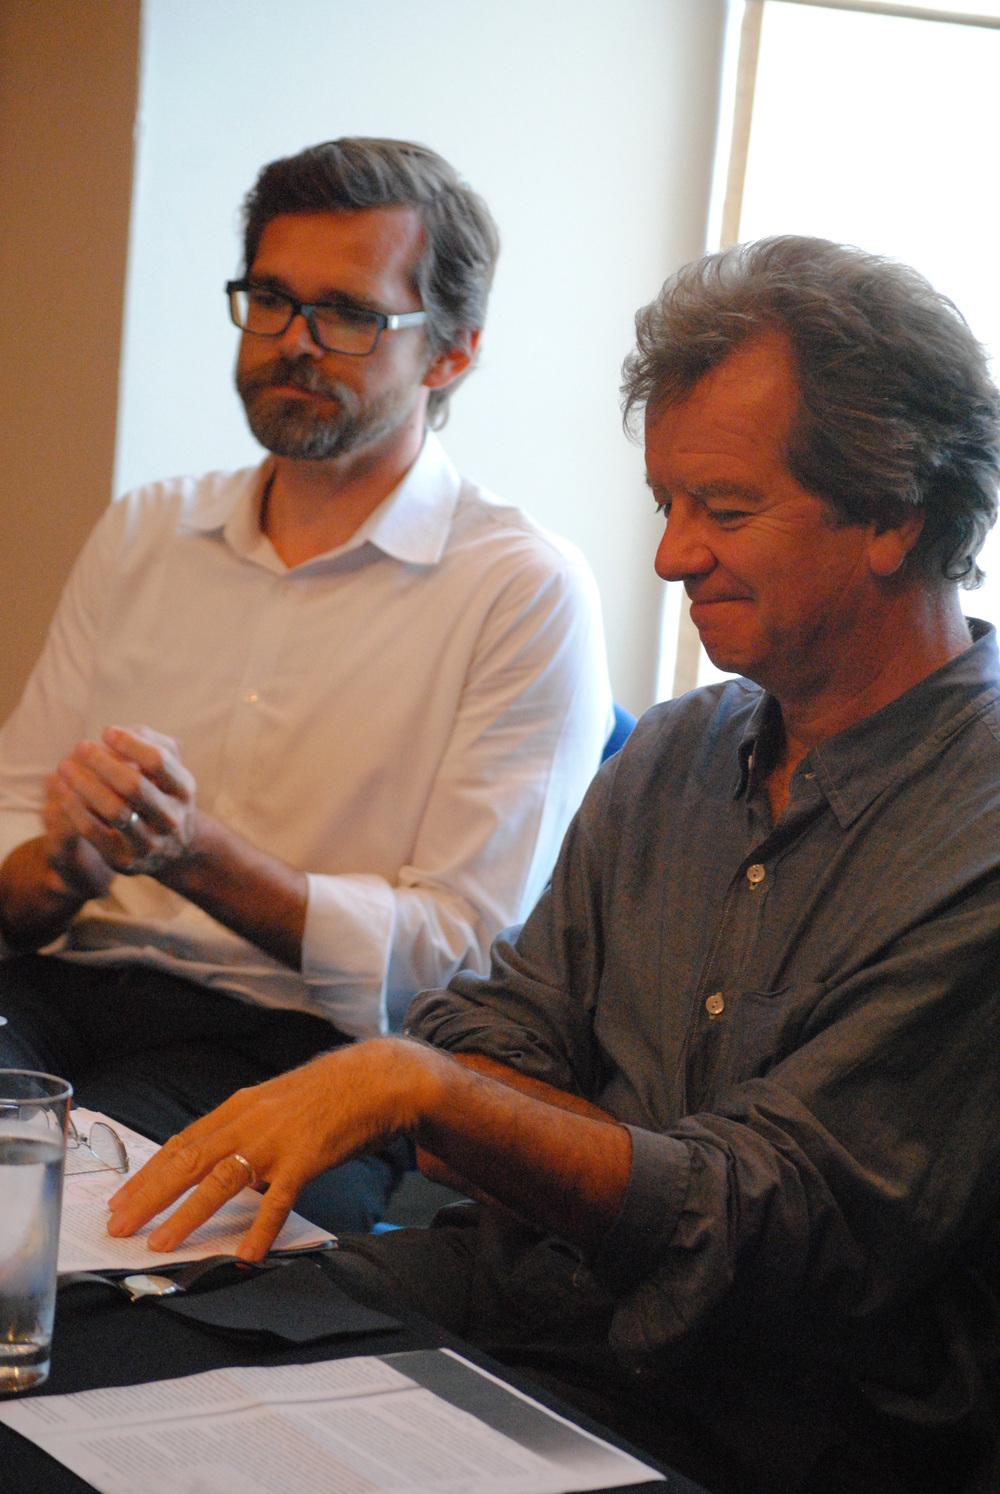 James Taylor and Dr. Richard Kearney